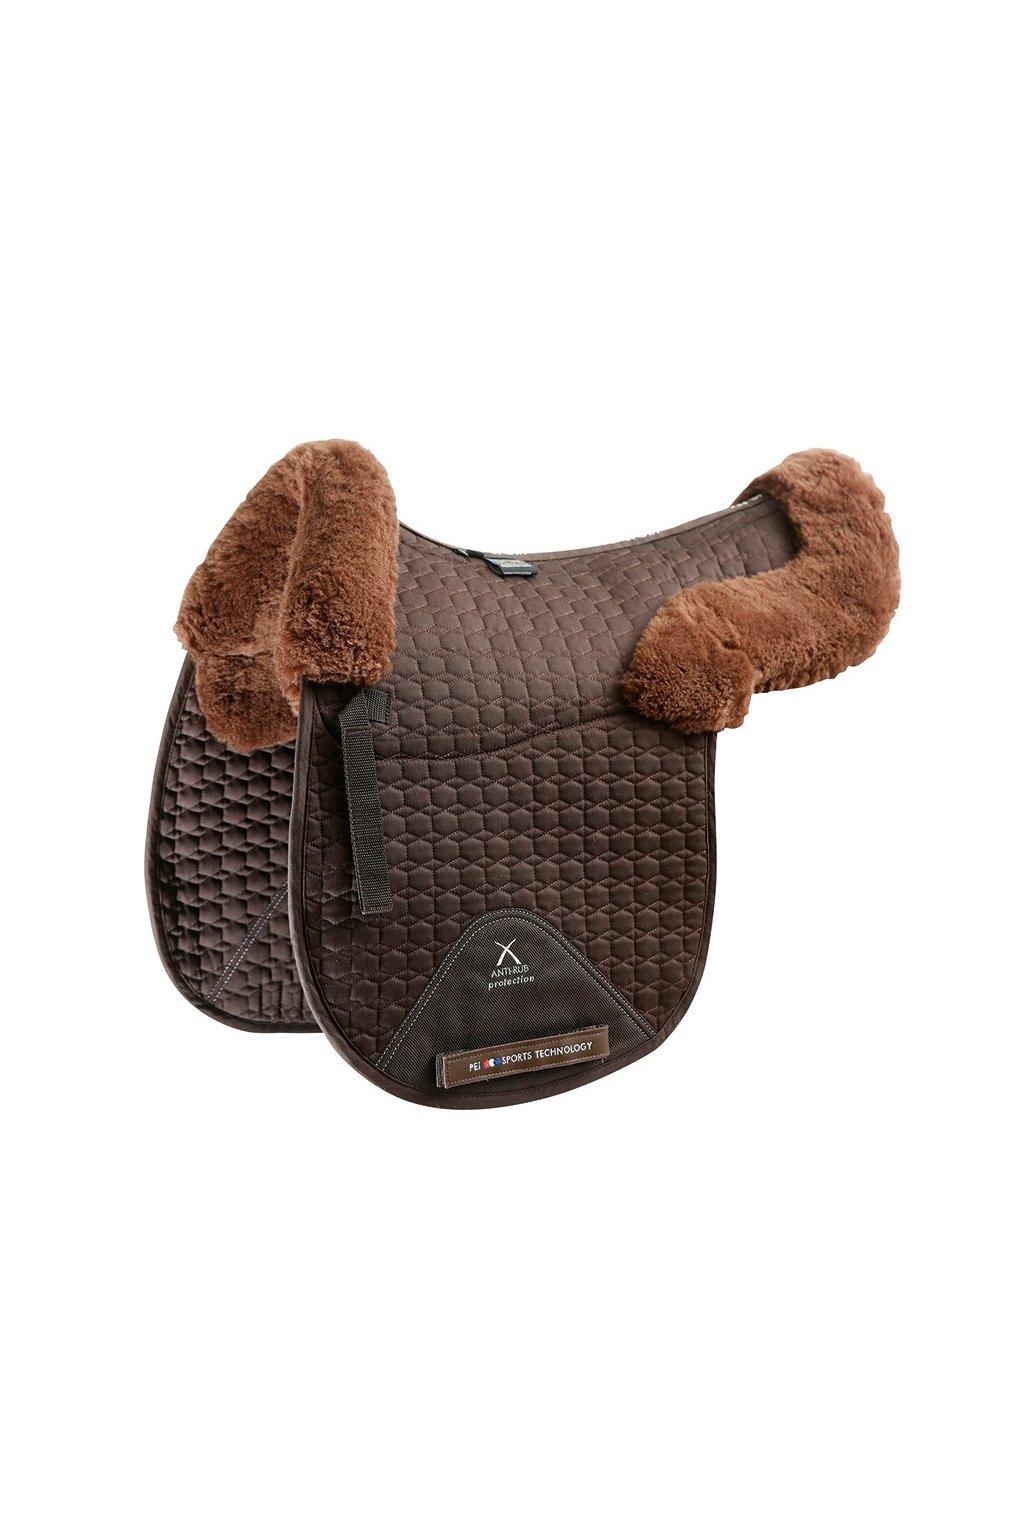 Podsedlová dečka Merino Wool Saddle Pad Premier Equine skoková